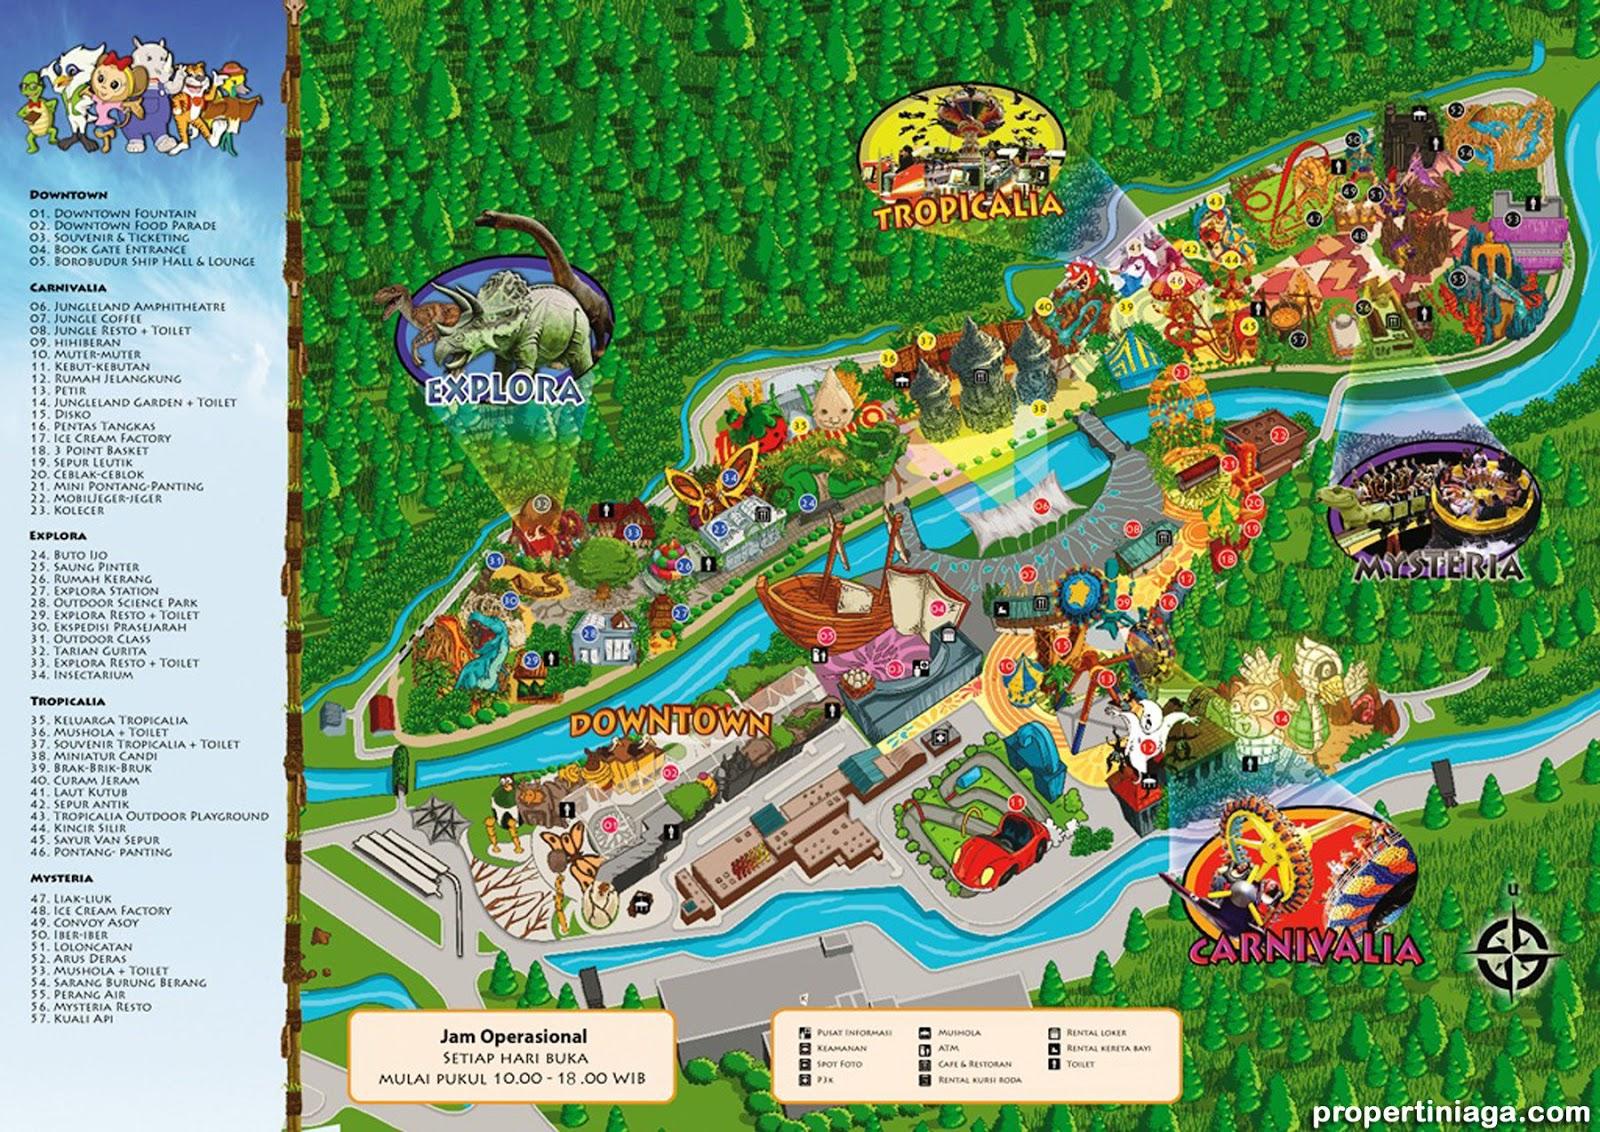 Sentul City Property Agustus 2013 Permainan Jungleland Adventure Theme Park